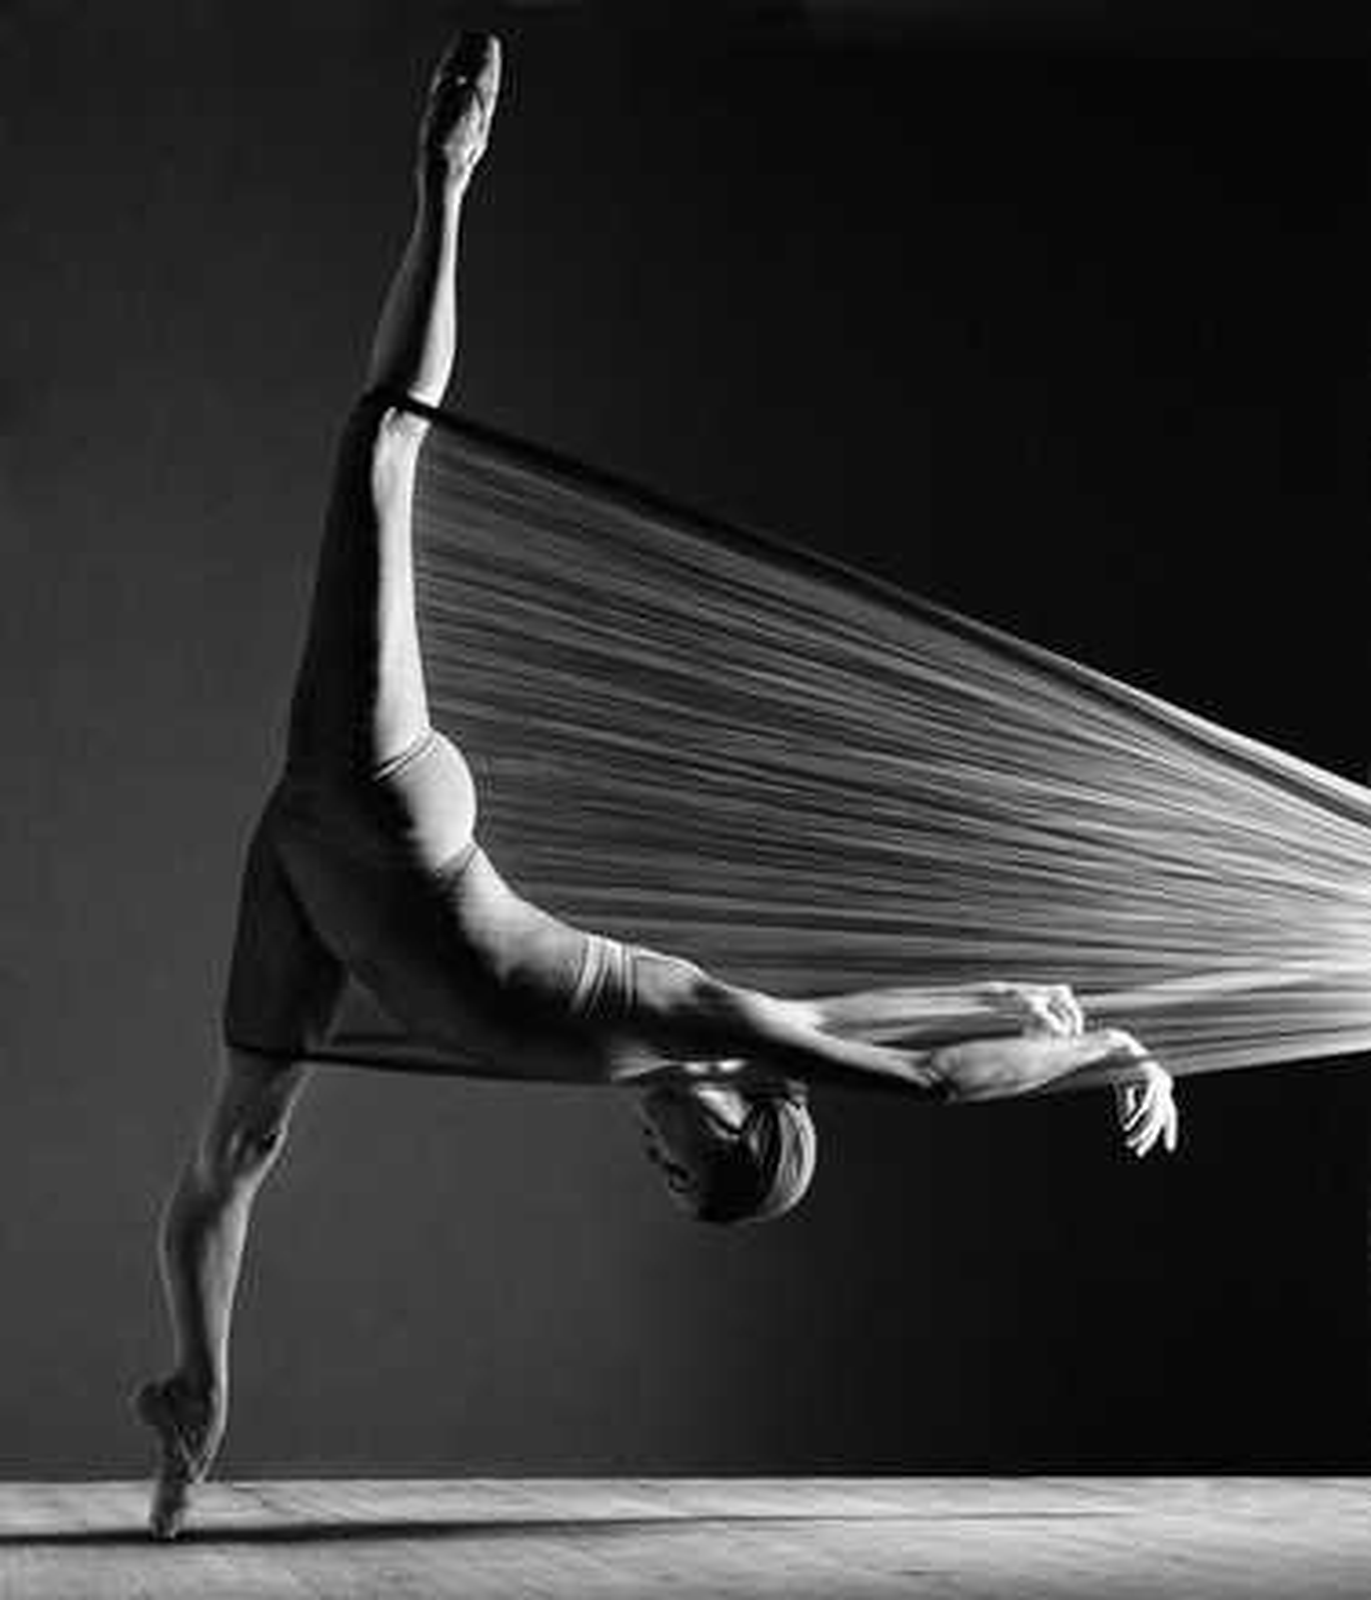 body network 2 - Michael Papendieck